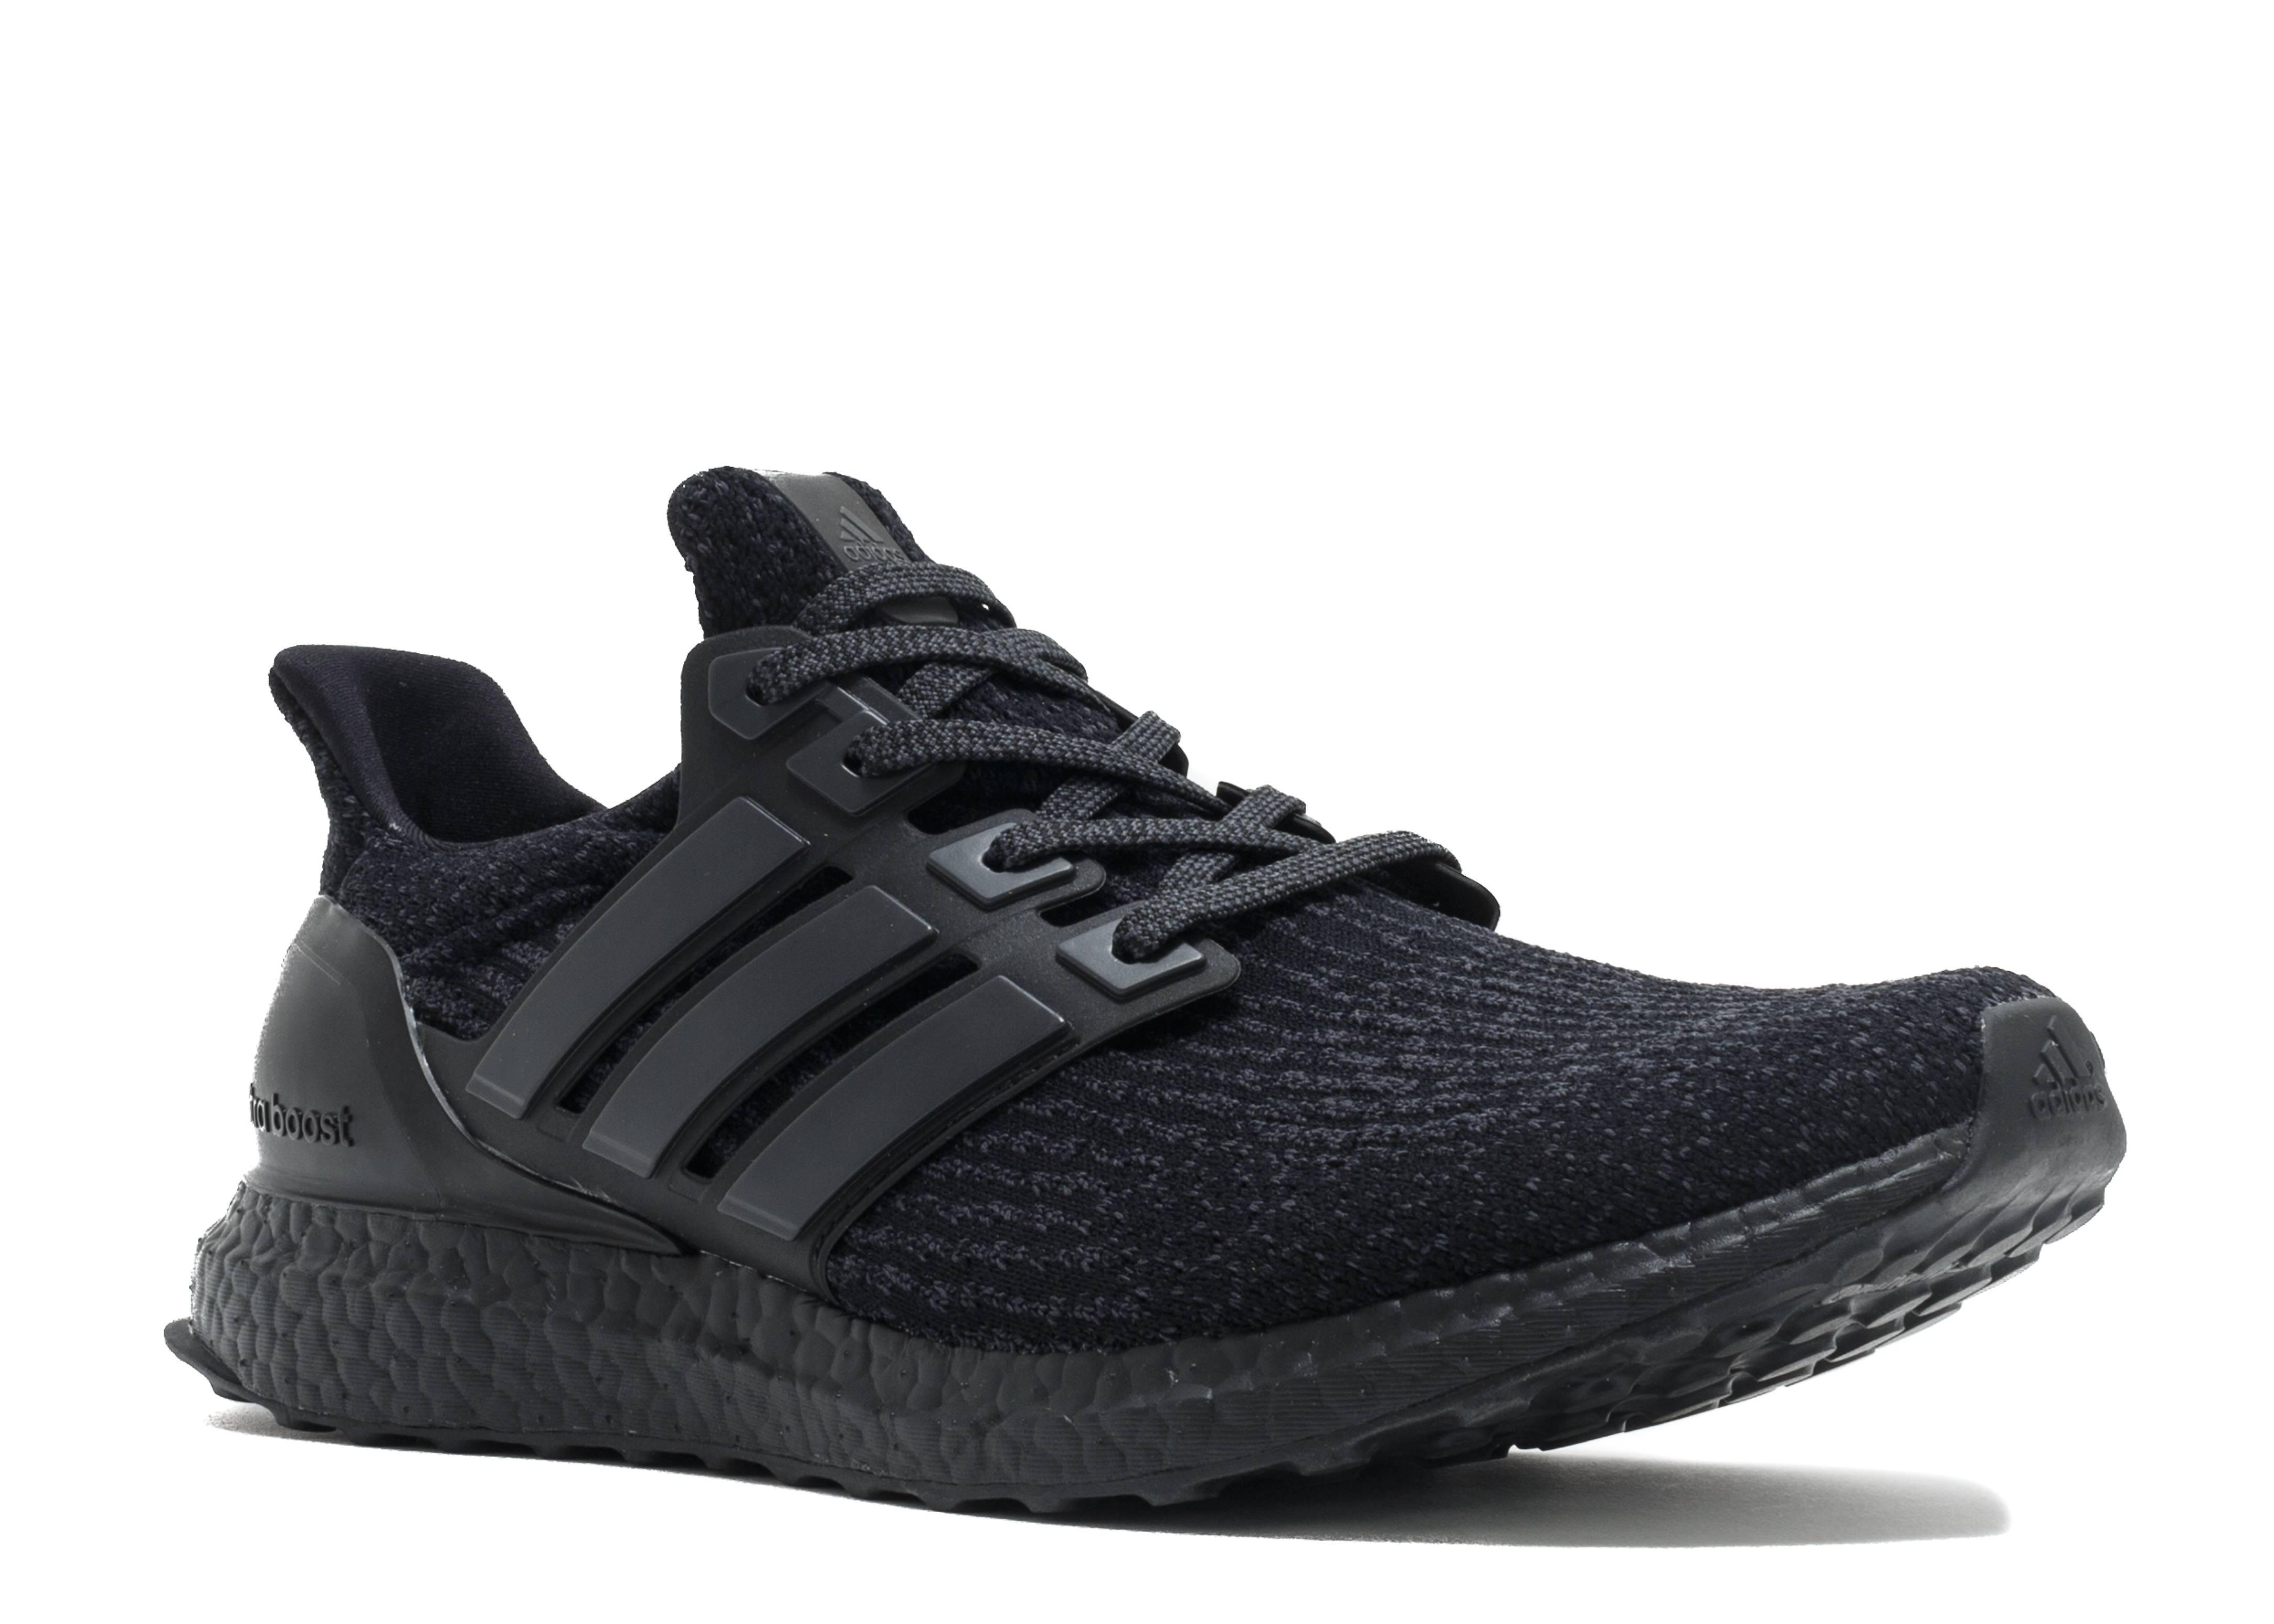 ffc7ada6c Adidas Ultra Boost 3.0 Triple Black - 1